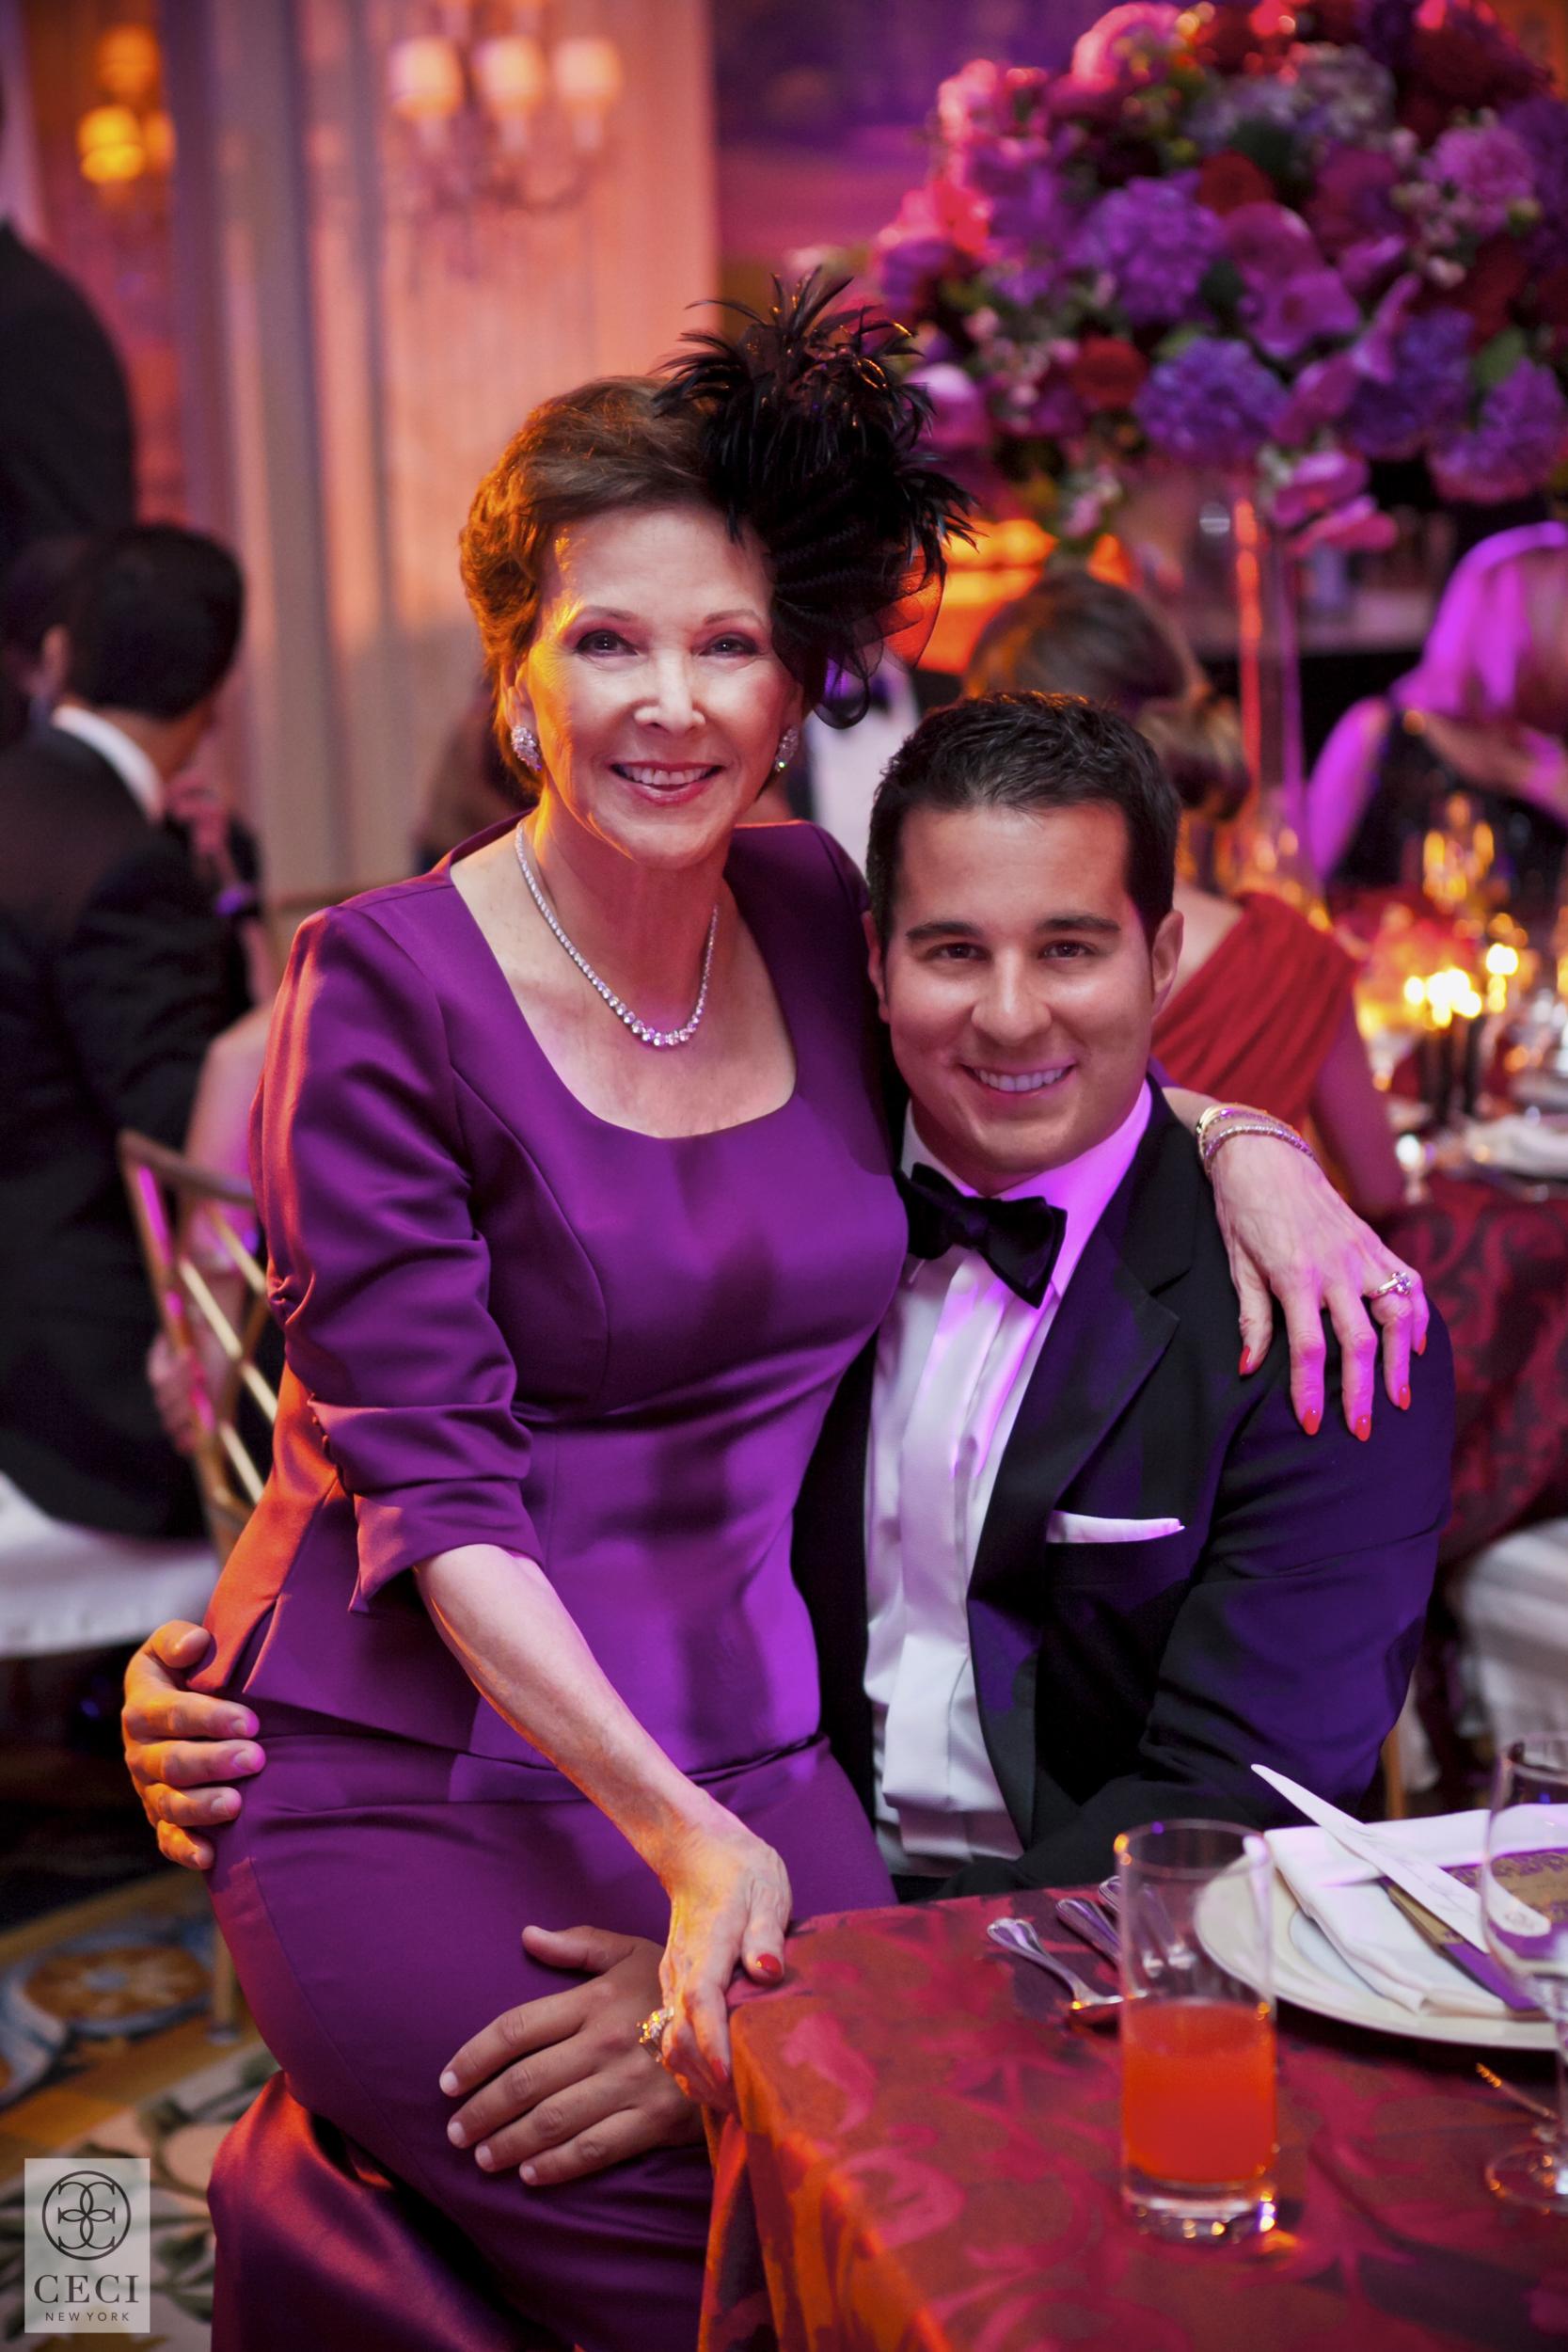 ceci_new_york_lucas_somoza_purple_regal_wediding_birthday_commitment_ceremony_gold-25.jpg